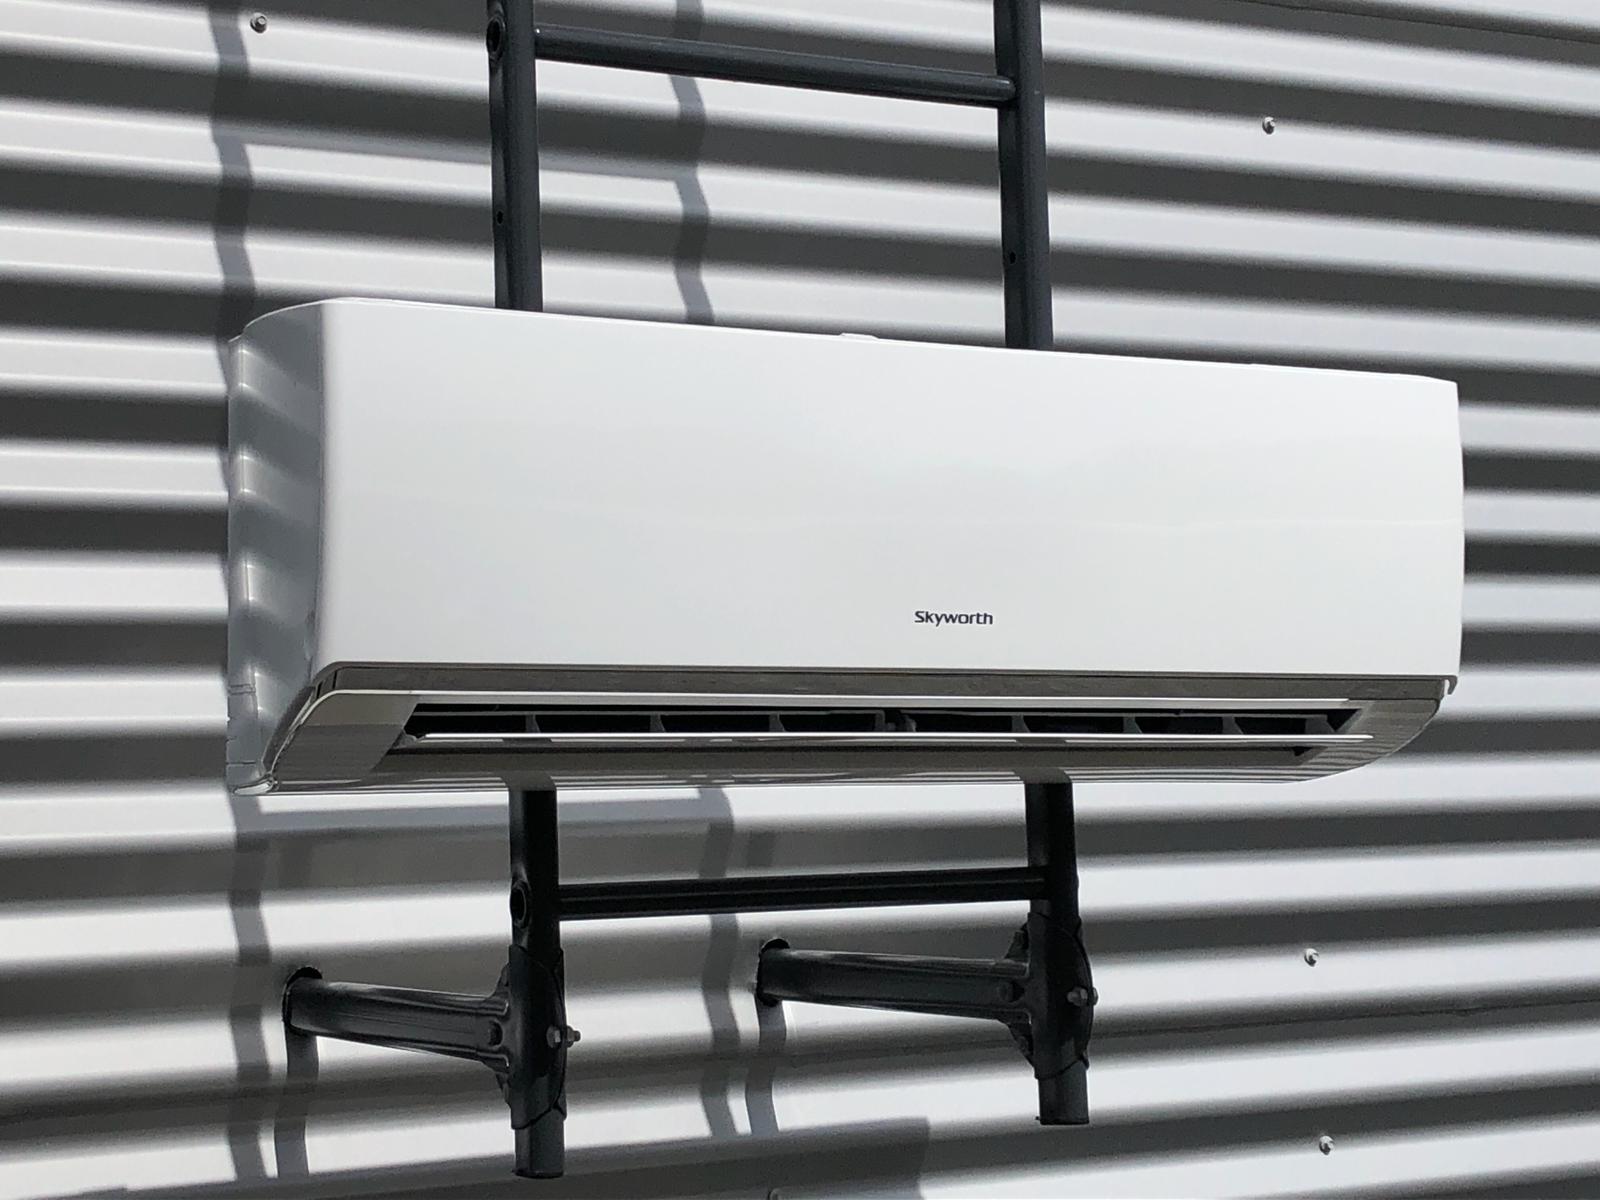 Skyworth lämpöpumppu Varsinais-Suomi